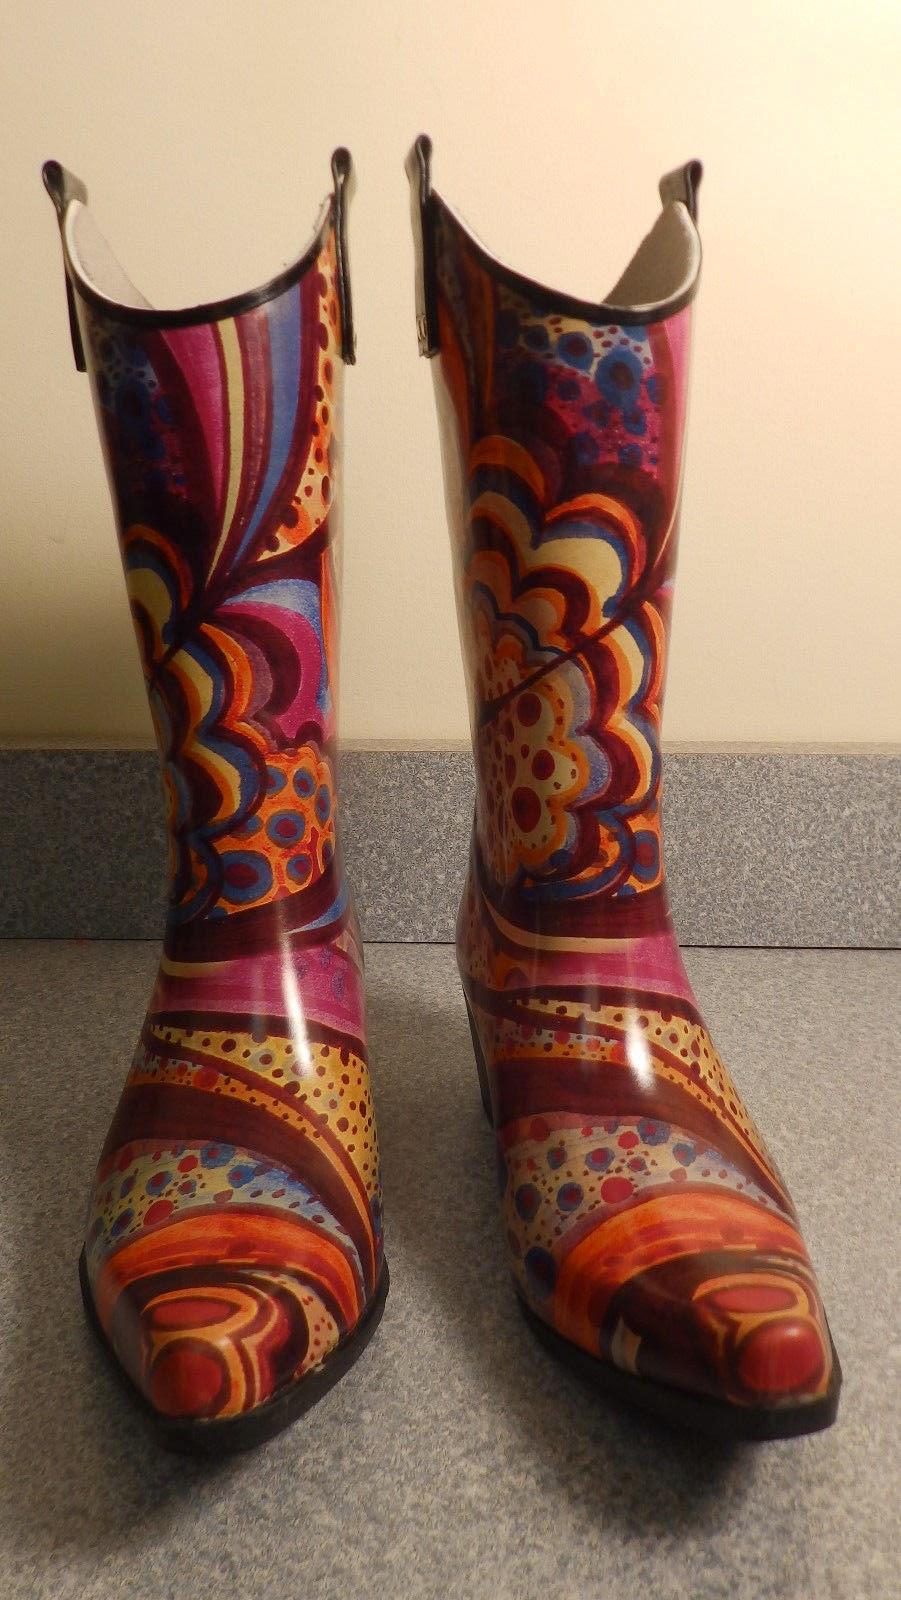 http://www.ebay.com/itm/Nomad-cowboy-rain-boots-womens-ladies-size-8-Monet-pattern-/321692570433?pt=LH_DefaultDomain_0&hash=item4ae65f1341